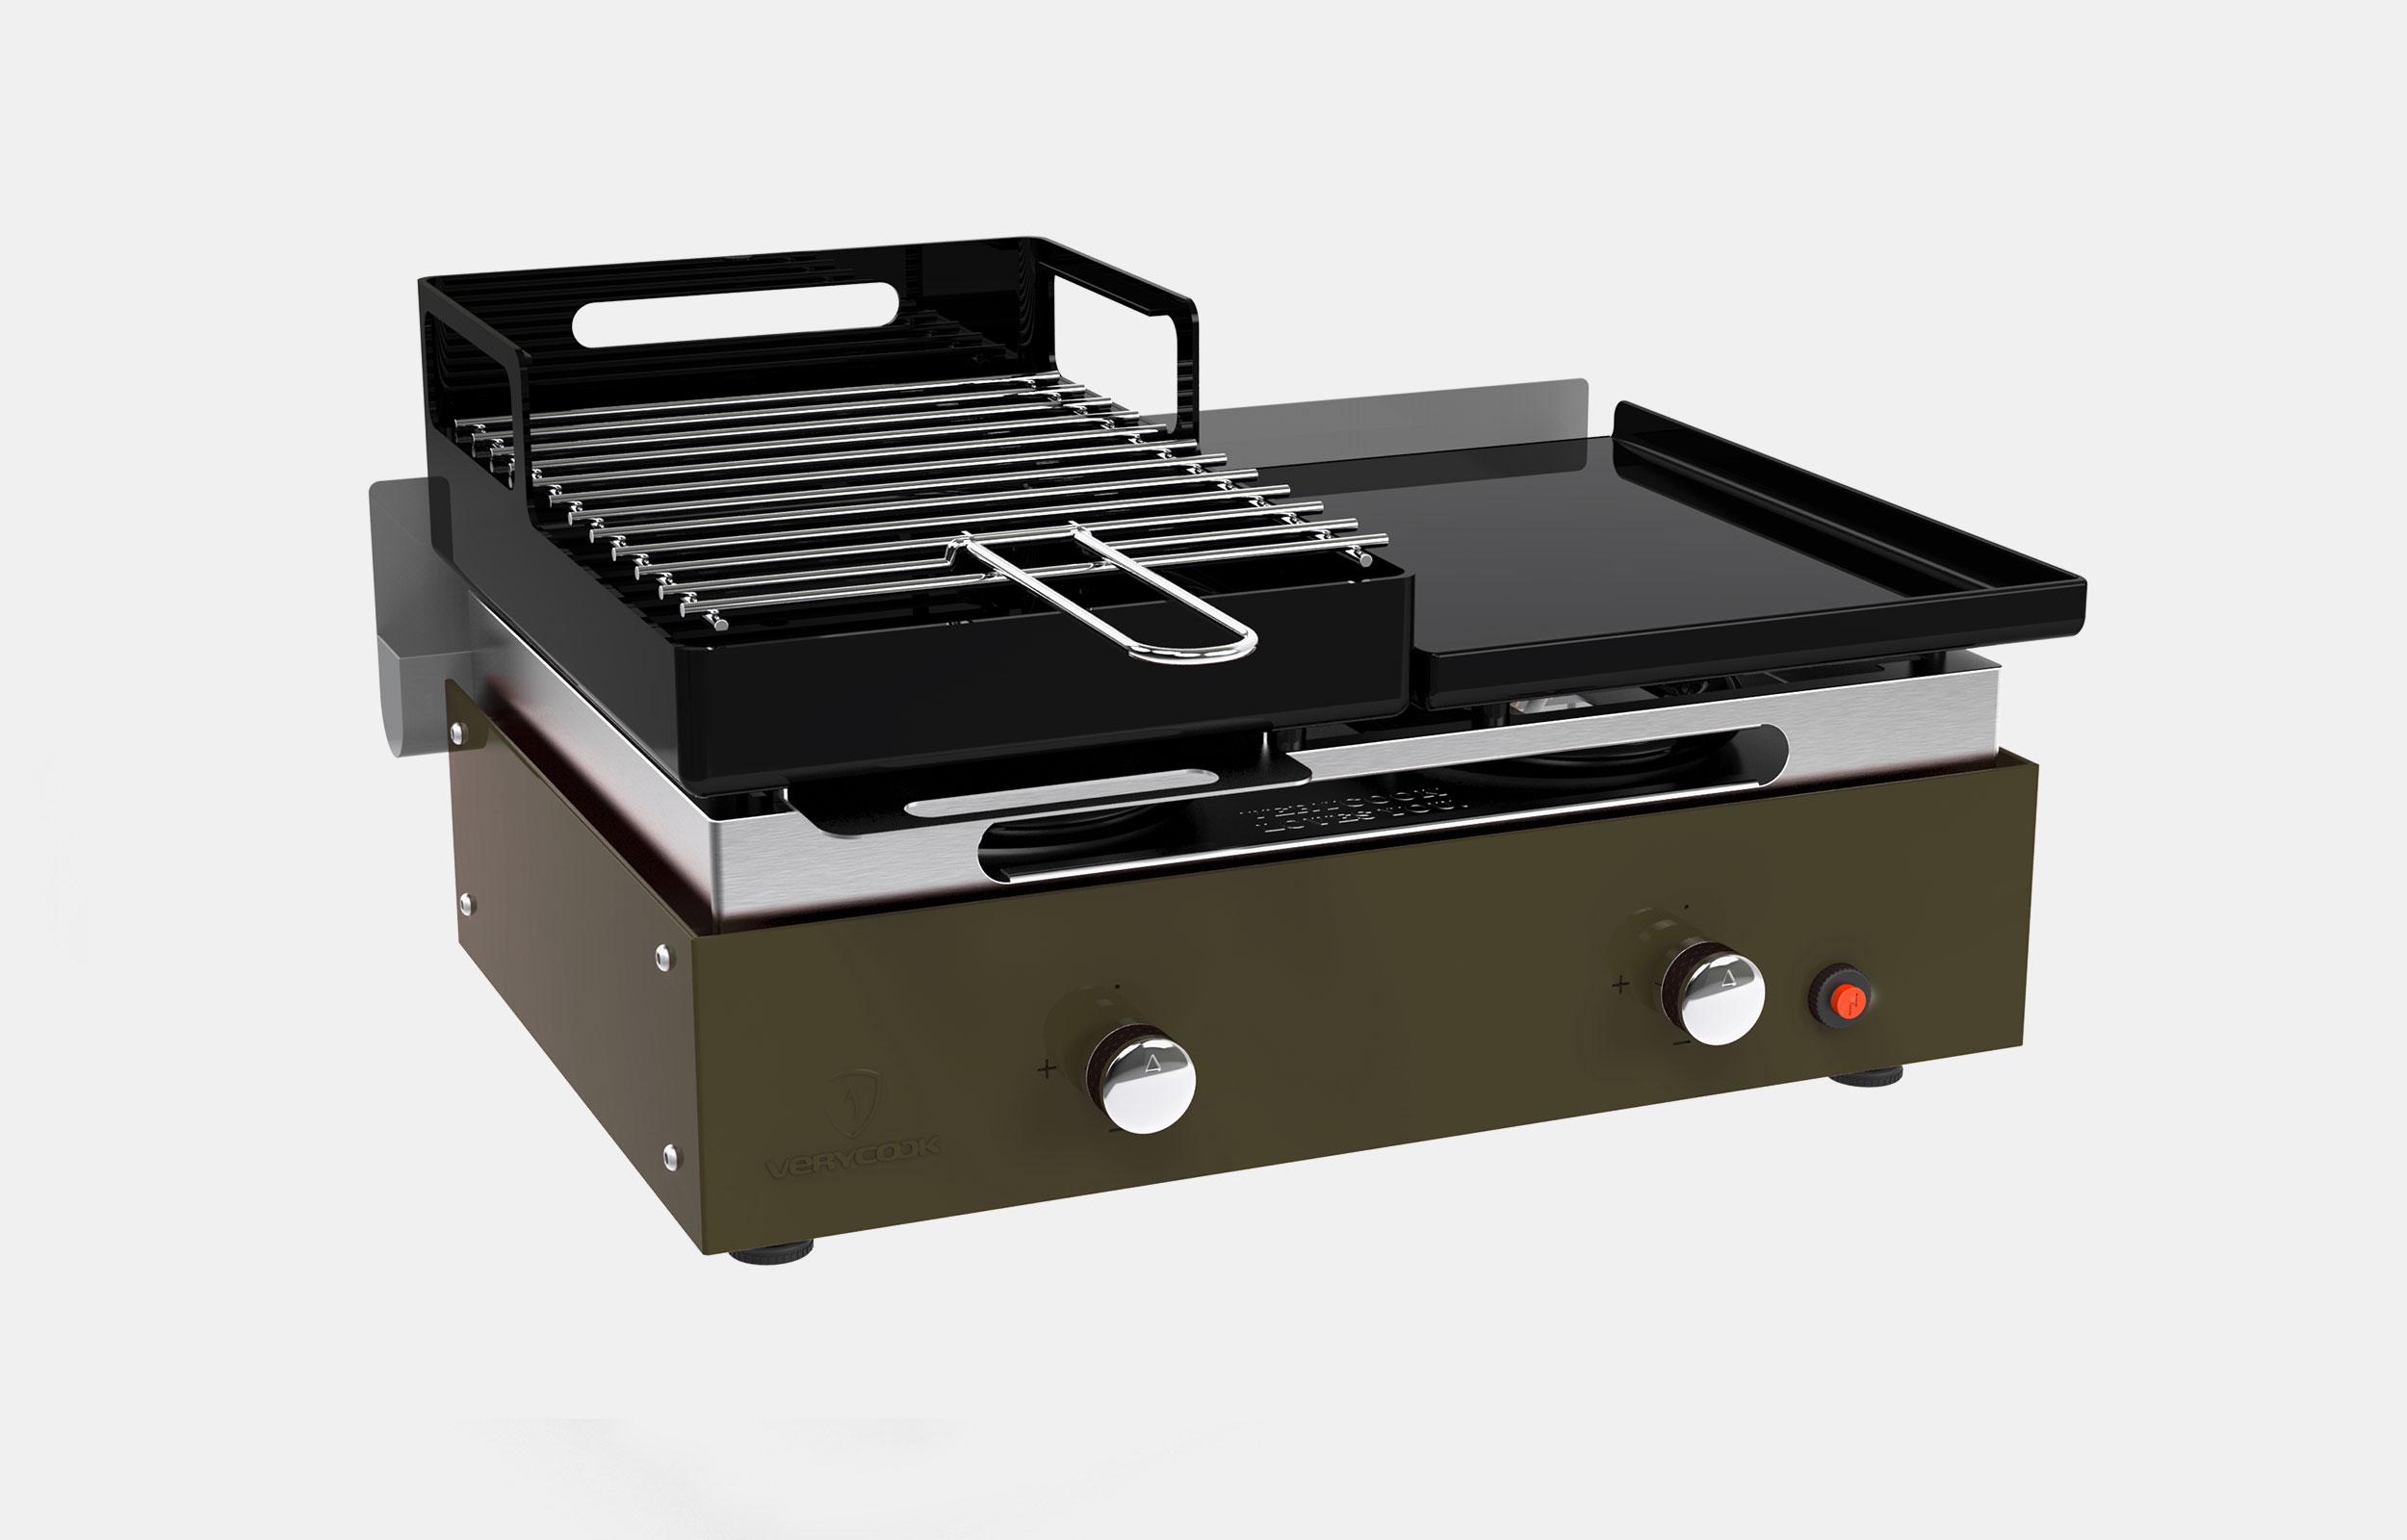 Comment Laver Une Plancha combiné plancha barbecue ☀ verycook